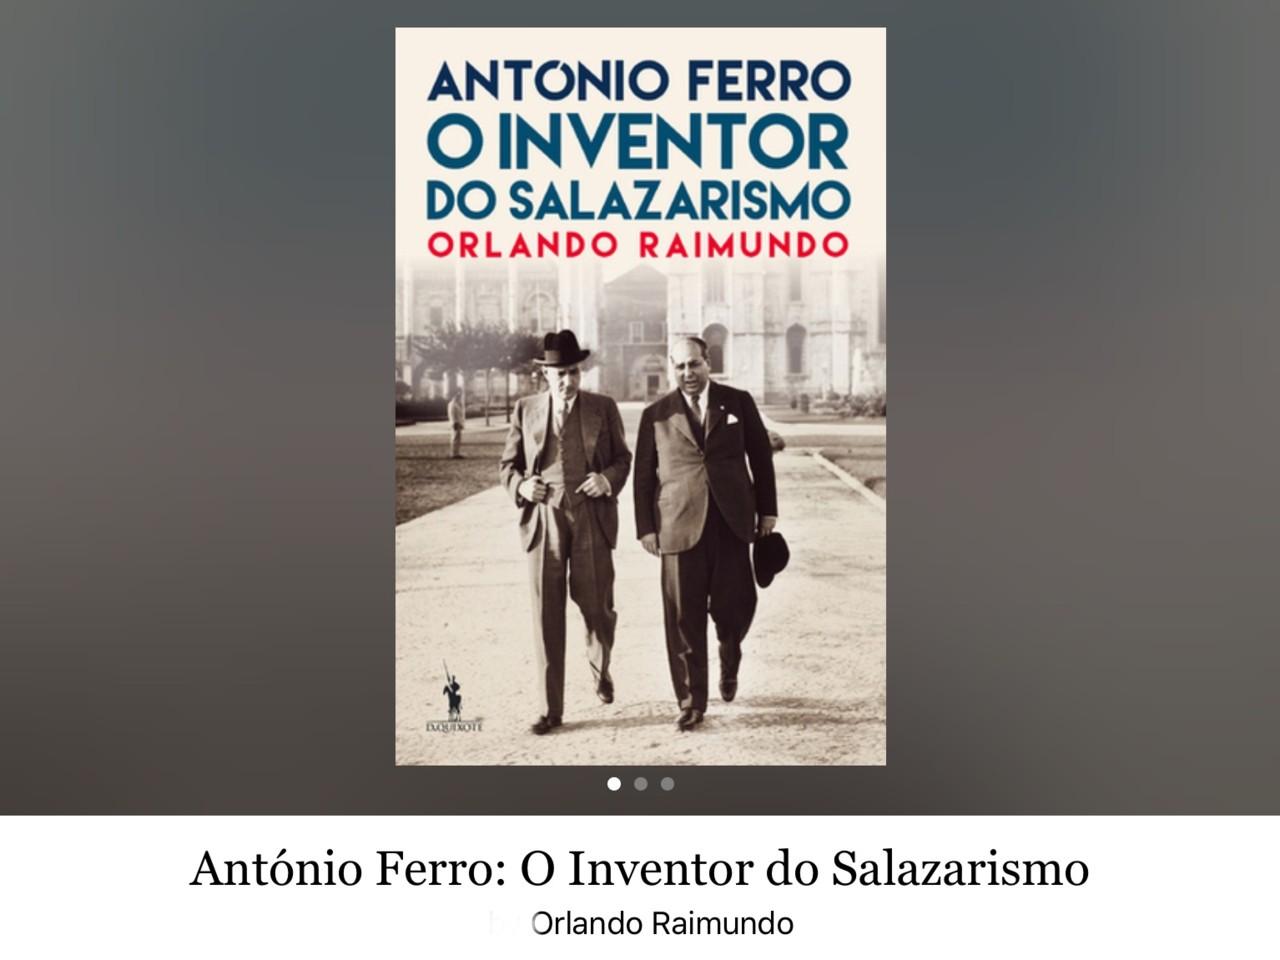 Orlando Raimundo, «António Ferro; o Inventor de Salazar», 1.ª ed., Dom Quixote, [Alfragide], 2015